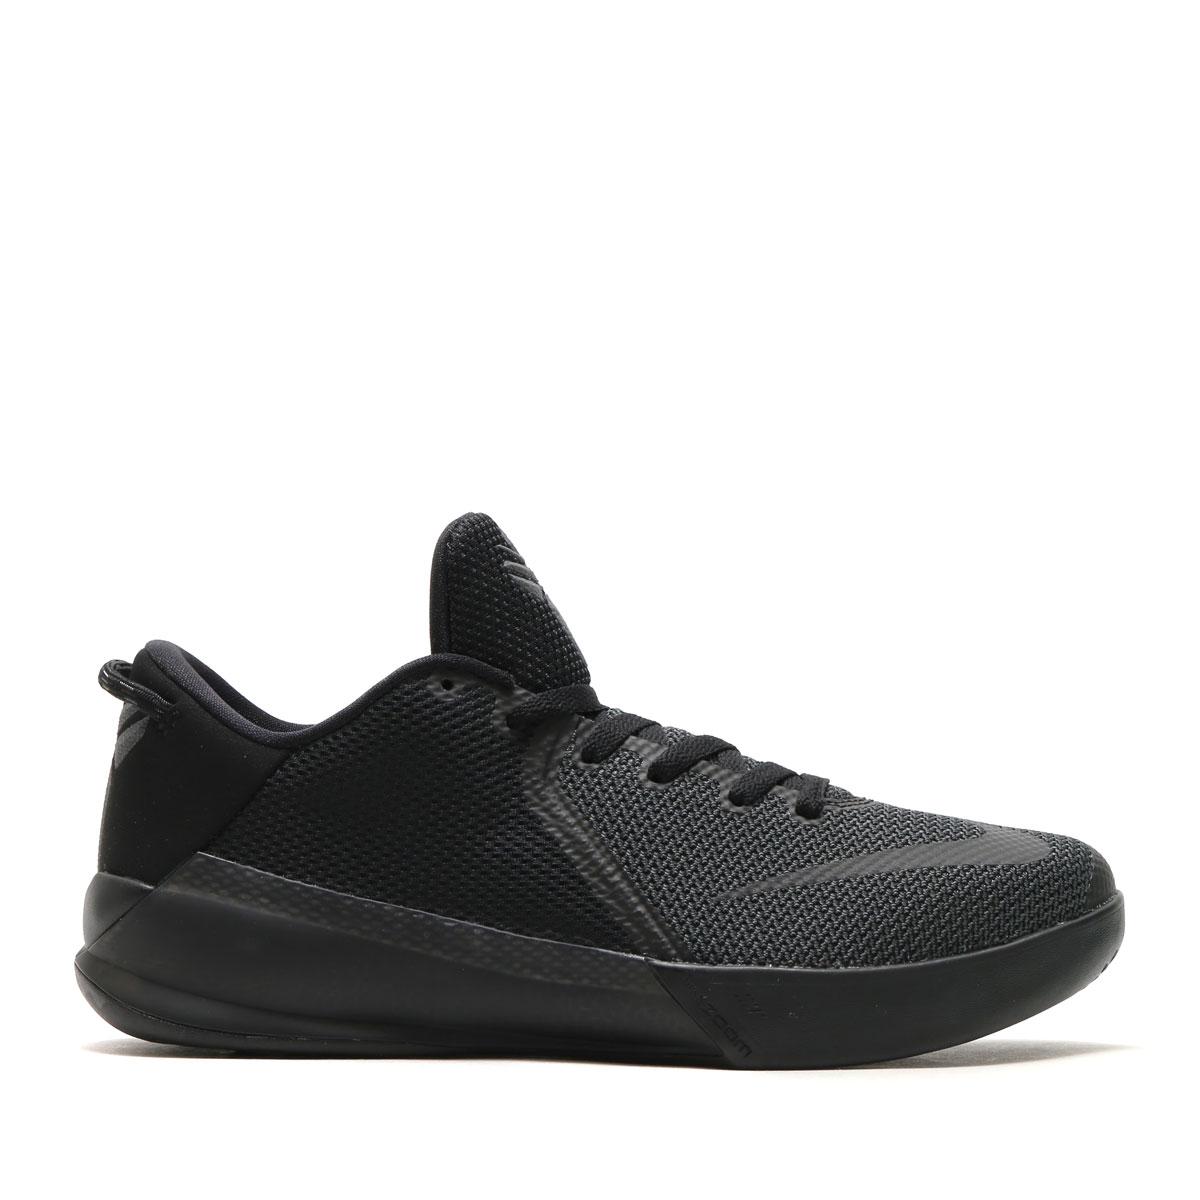 c3e8e44bc5f6 NIKE ZOOM KOBE VENOMENON 6 EP (Nike zoom Corby beno Menon 6 EP) BLACK BLACK-WHITE  17FA-I